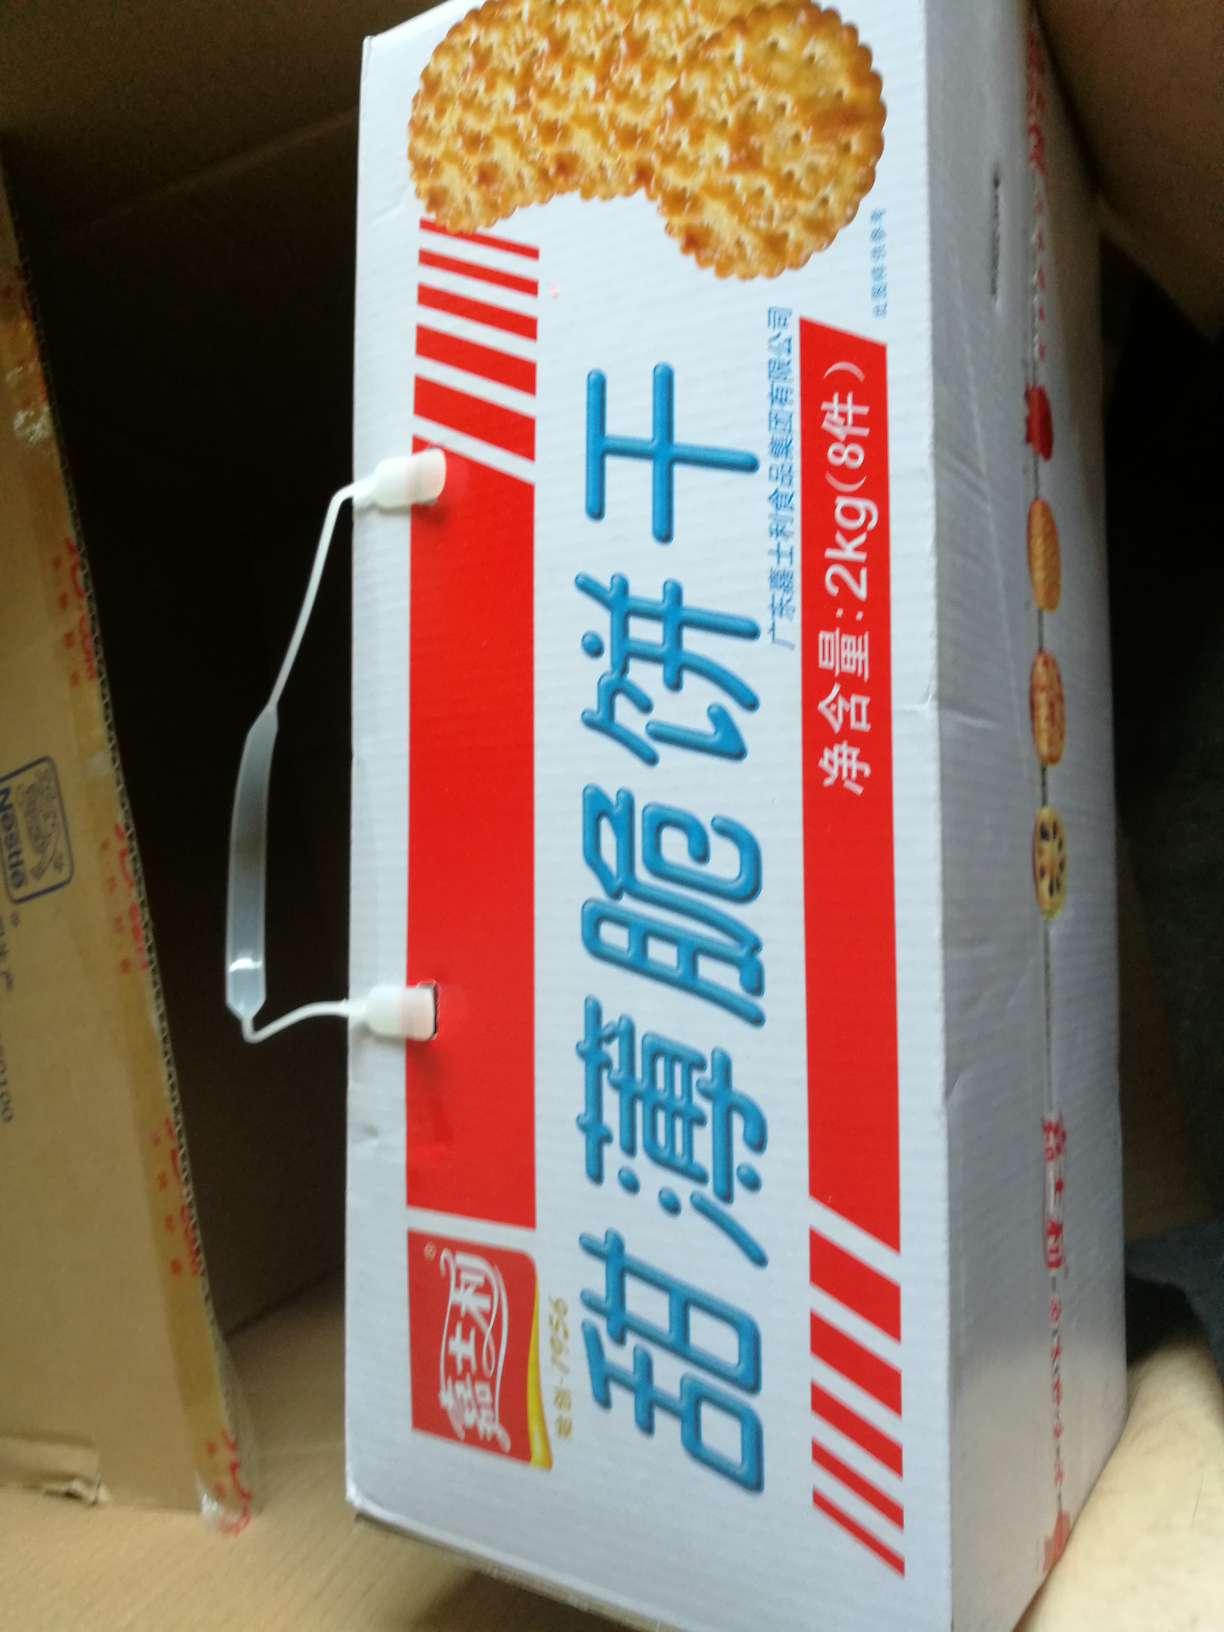 matsuda eyewear amazon 0025731 shop